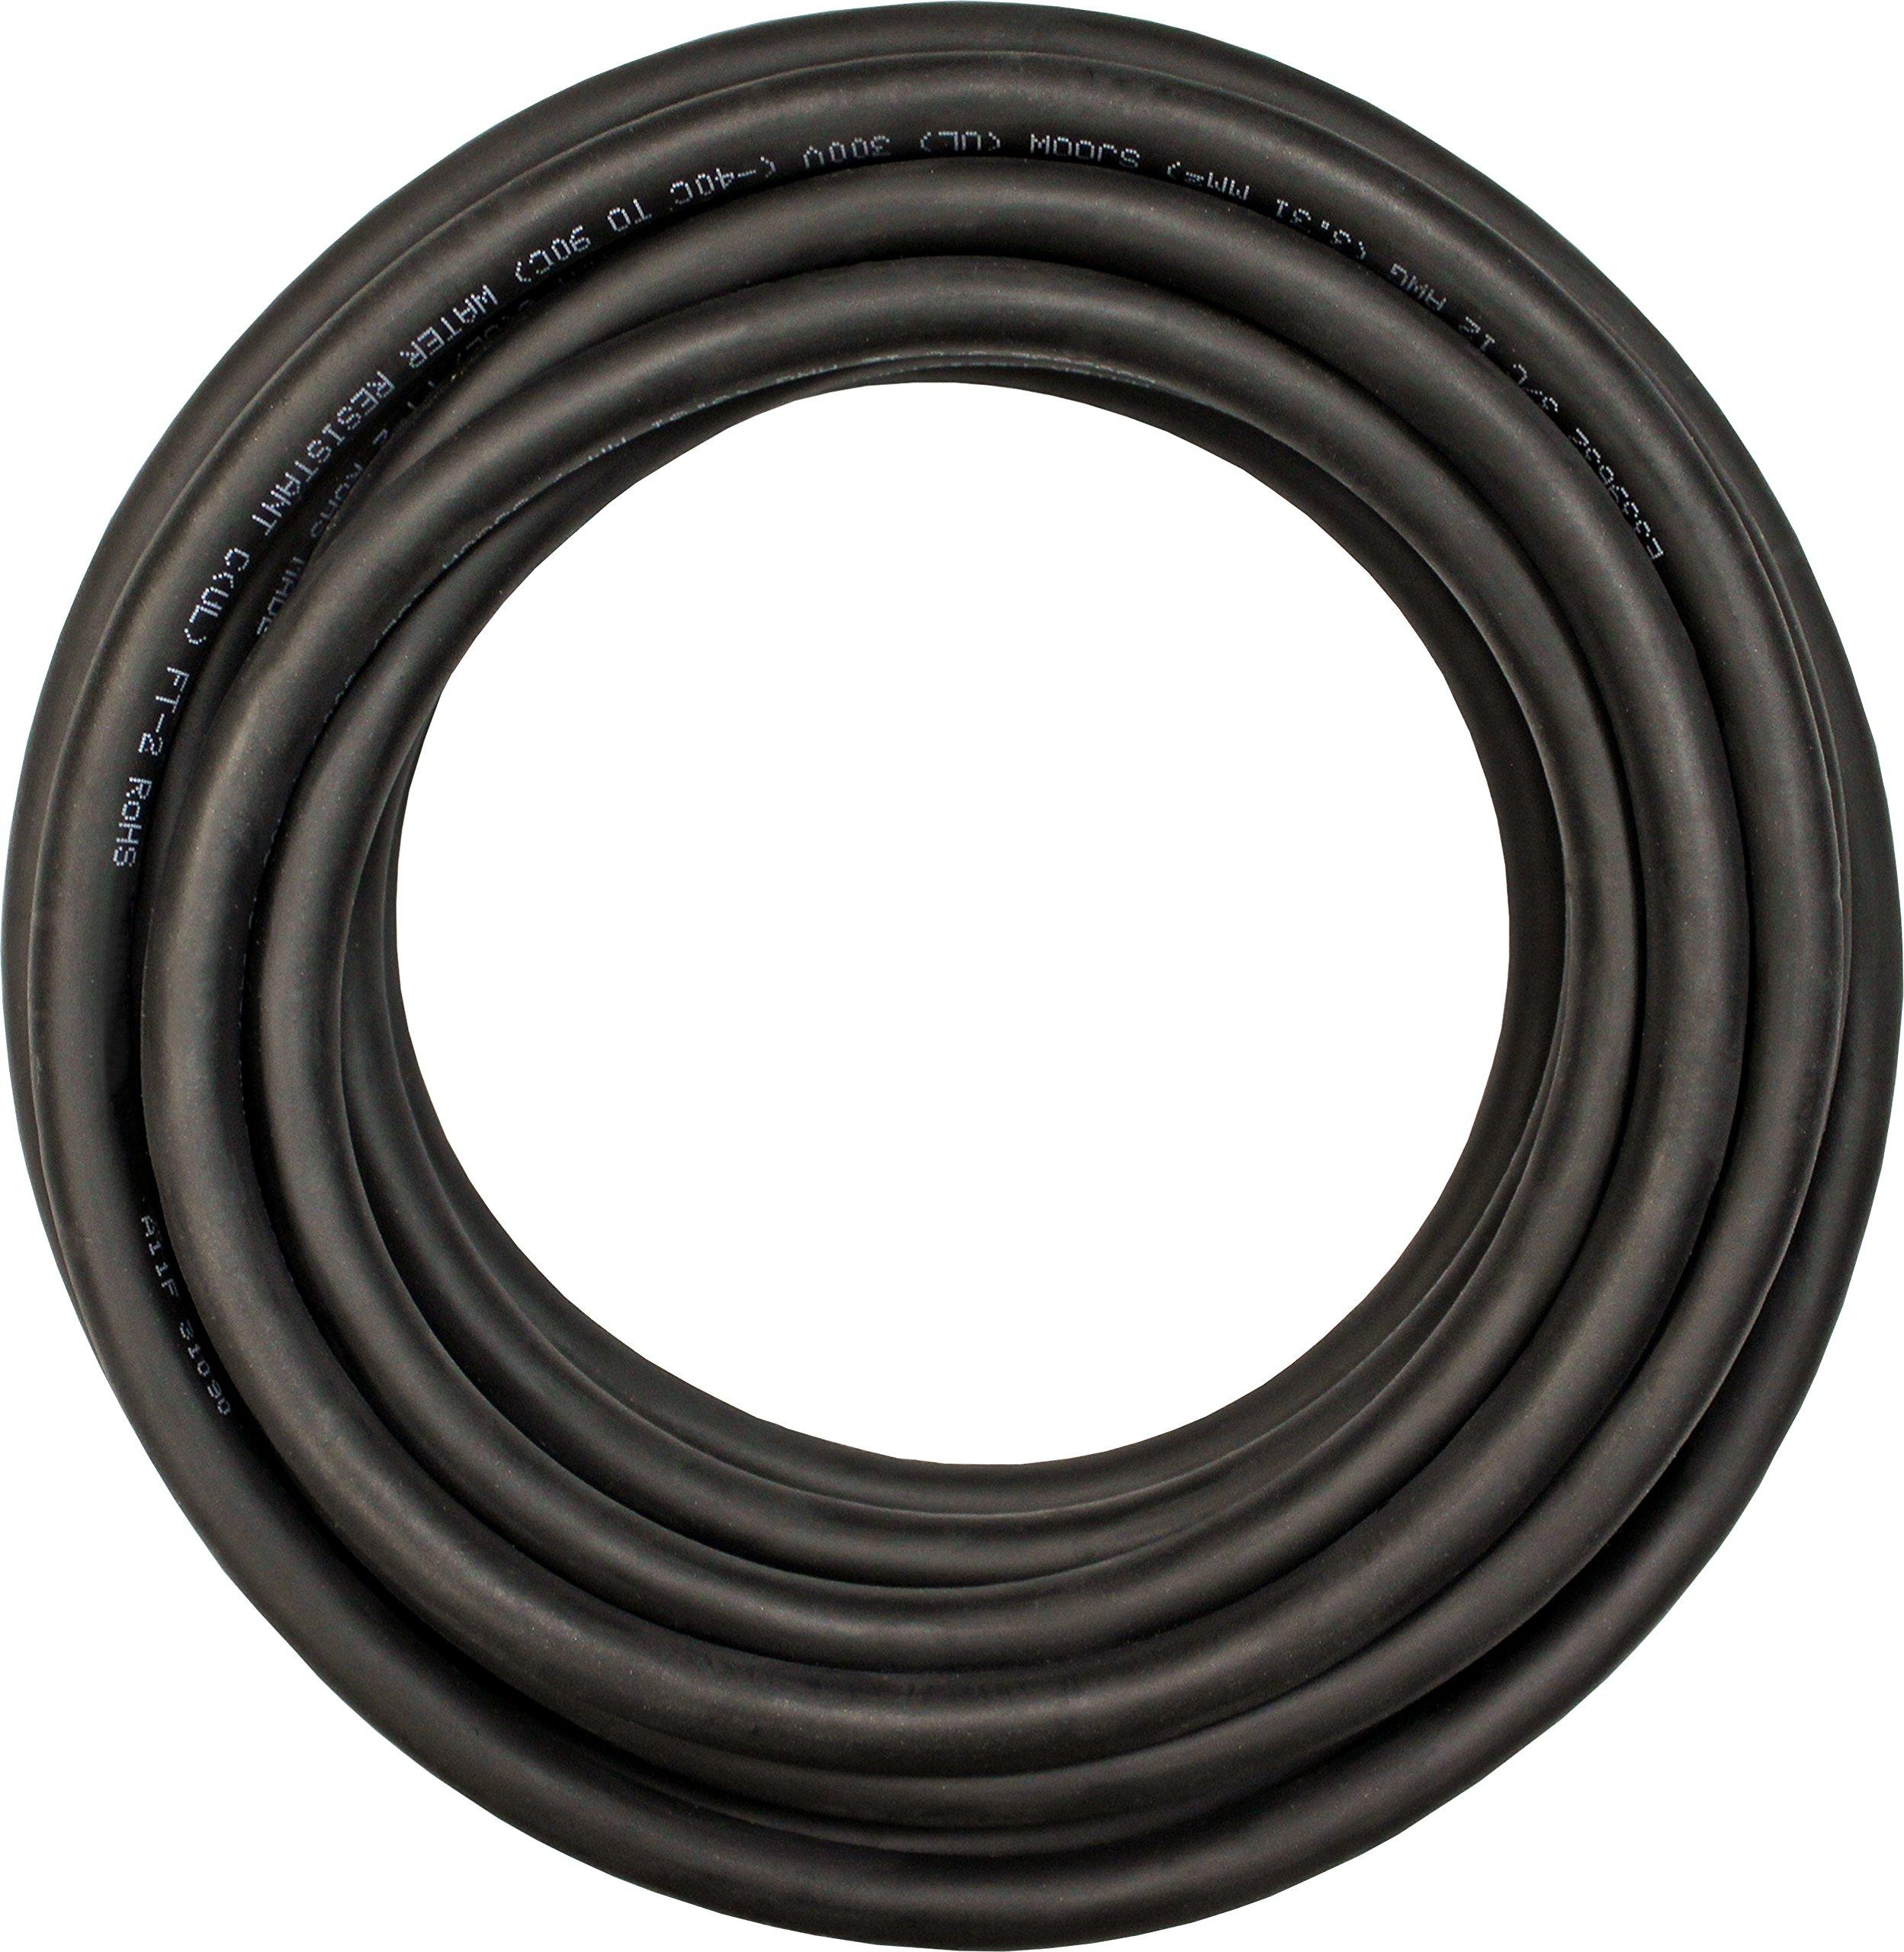 Cerrowire 283-4203C 100-Feet 6/3 SOOW Rubber Flexible Extra Heavy Duty Cord, Black